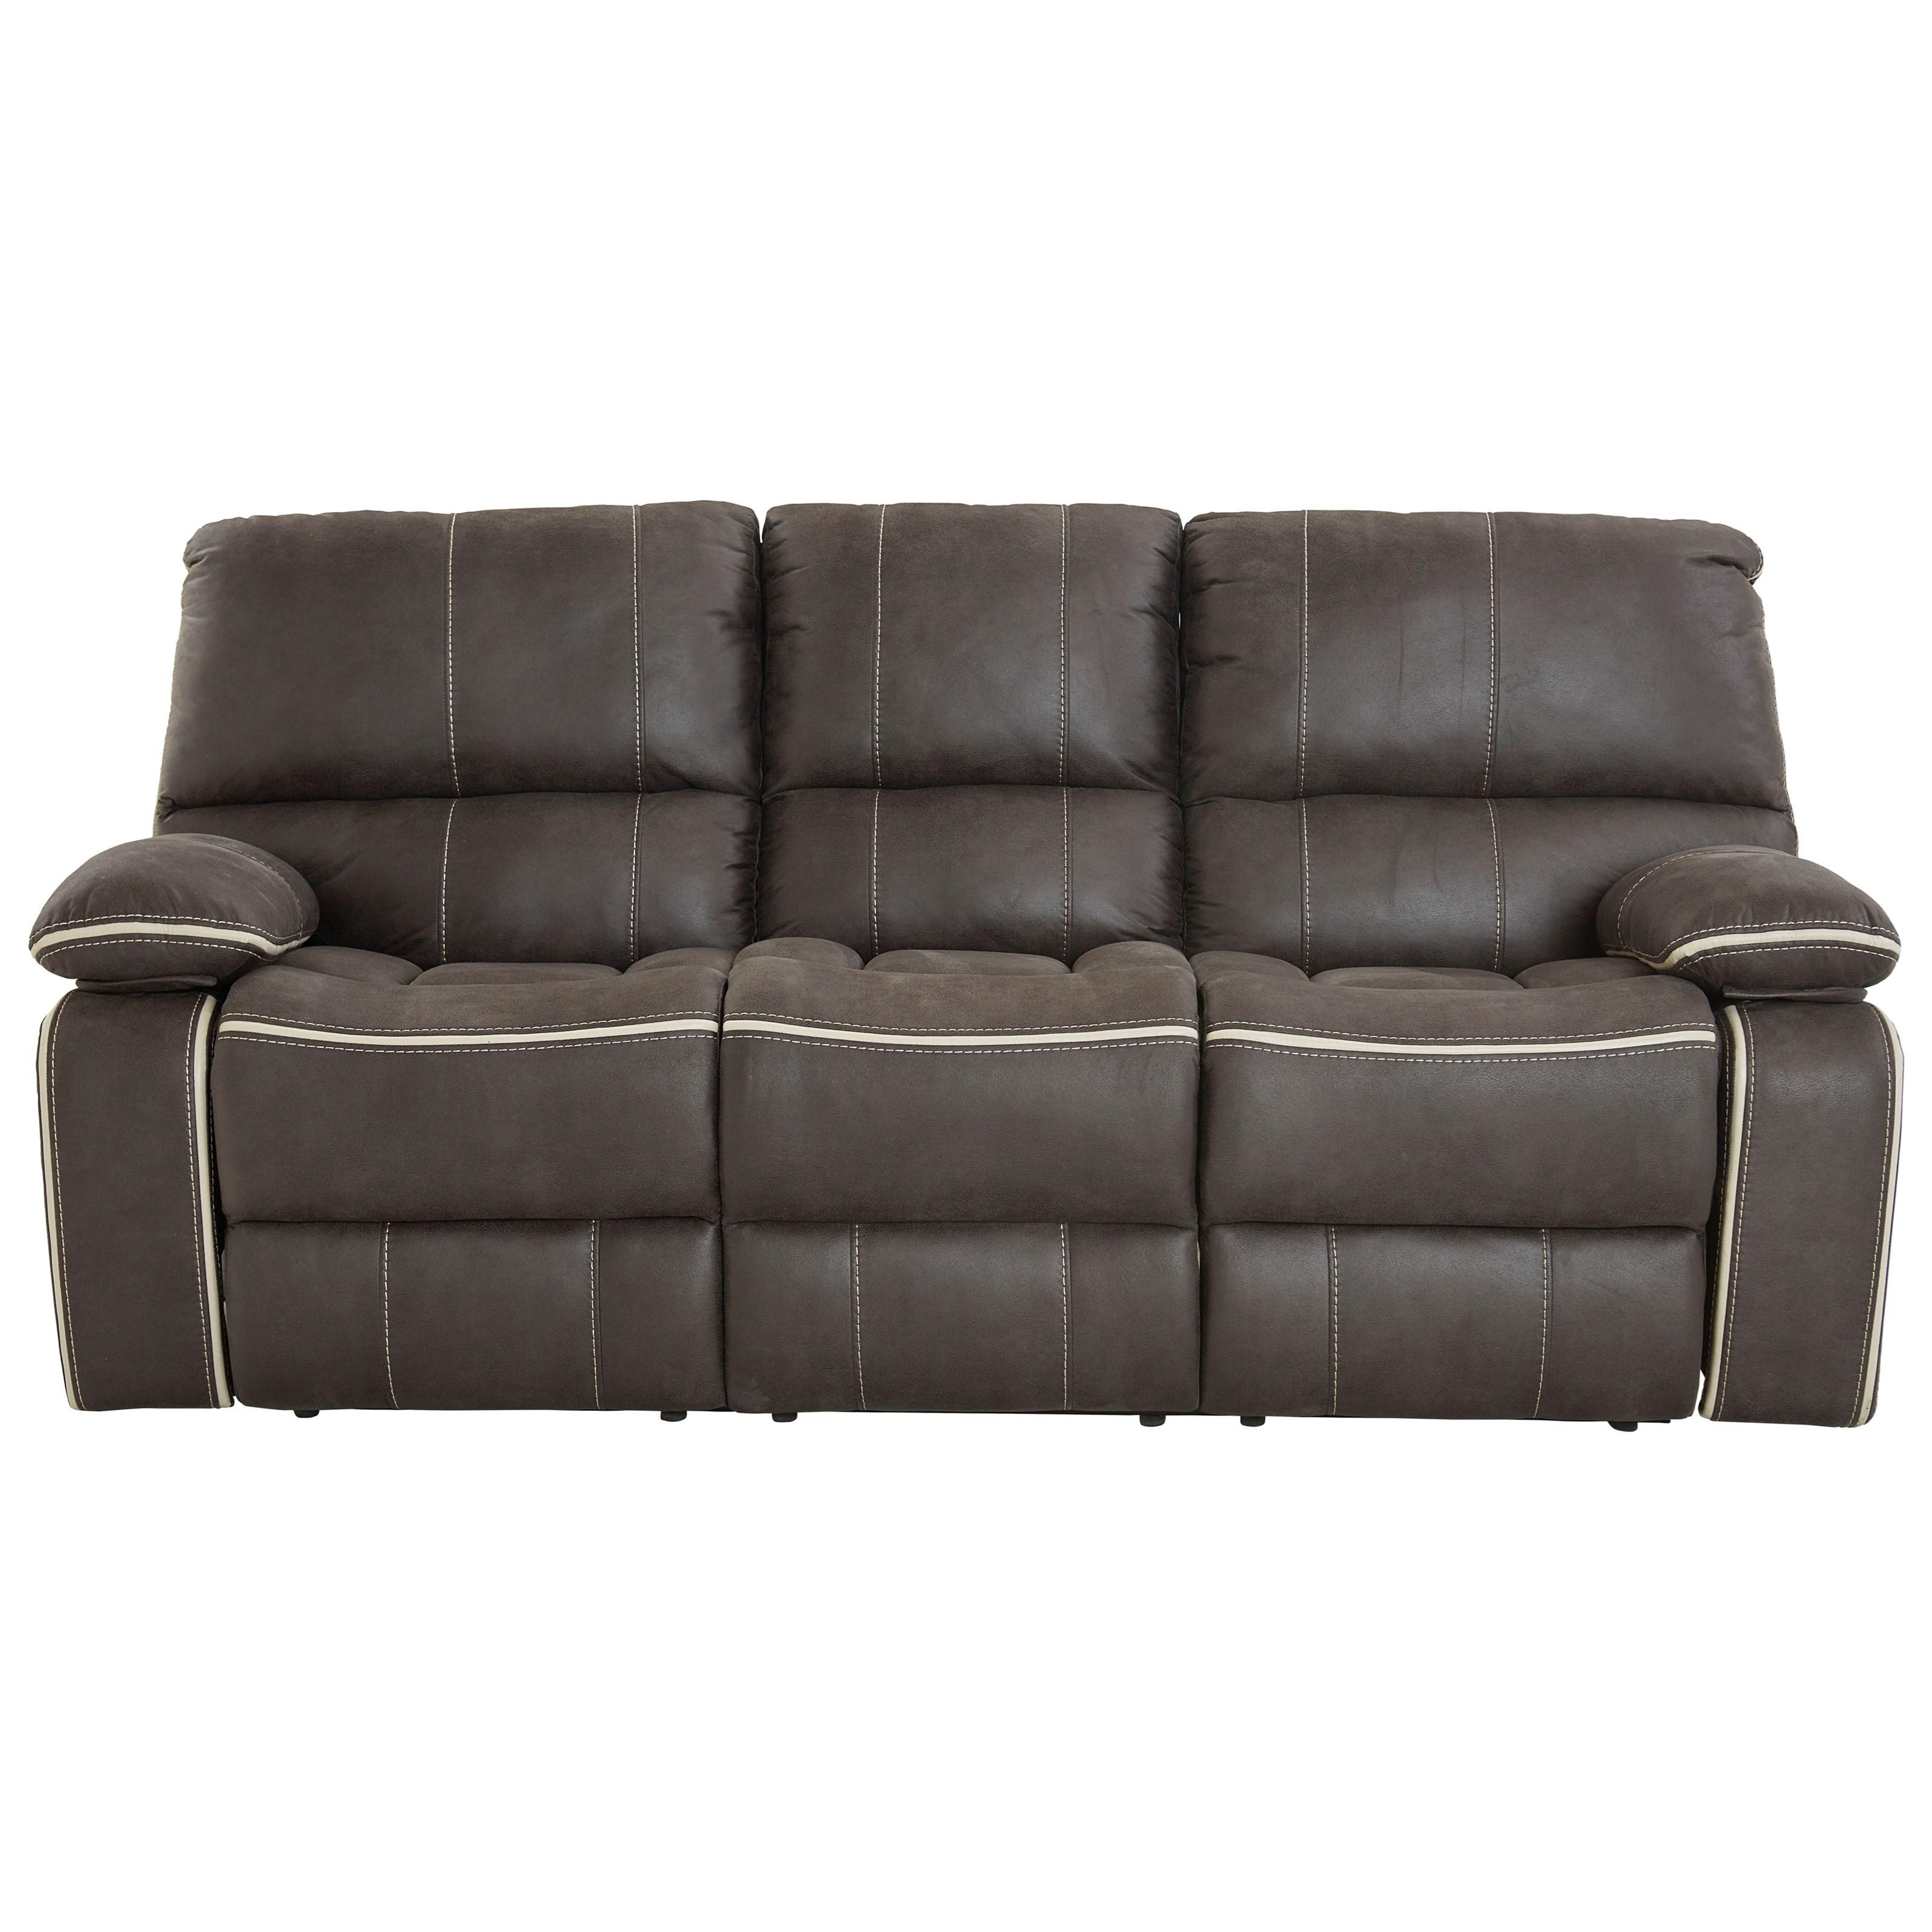 Arlington Sofa by Standard Furniture at Beds N Stuff